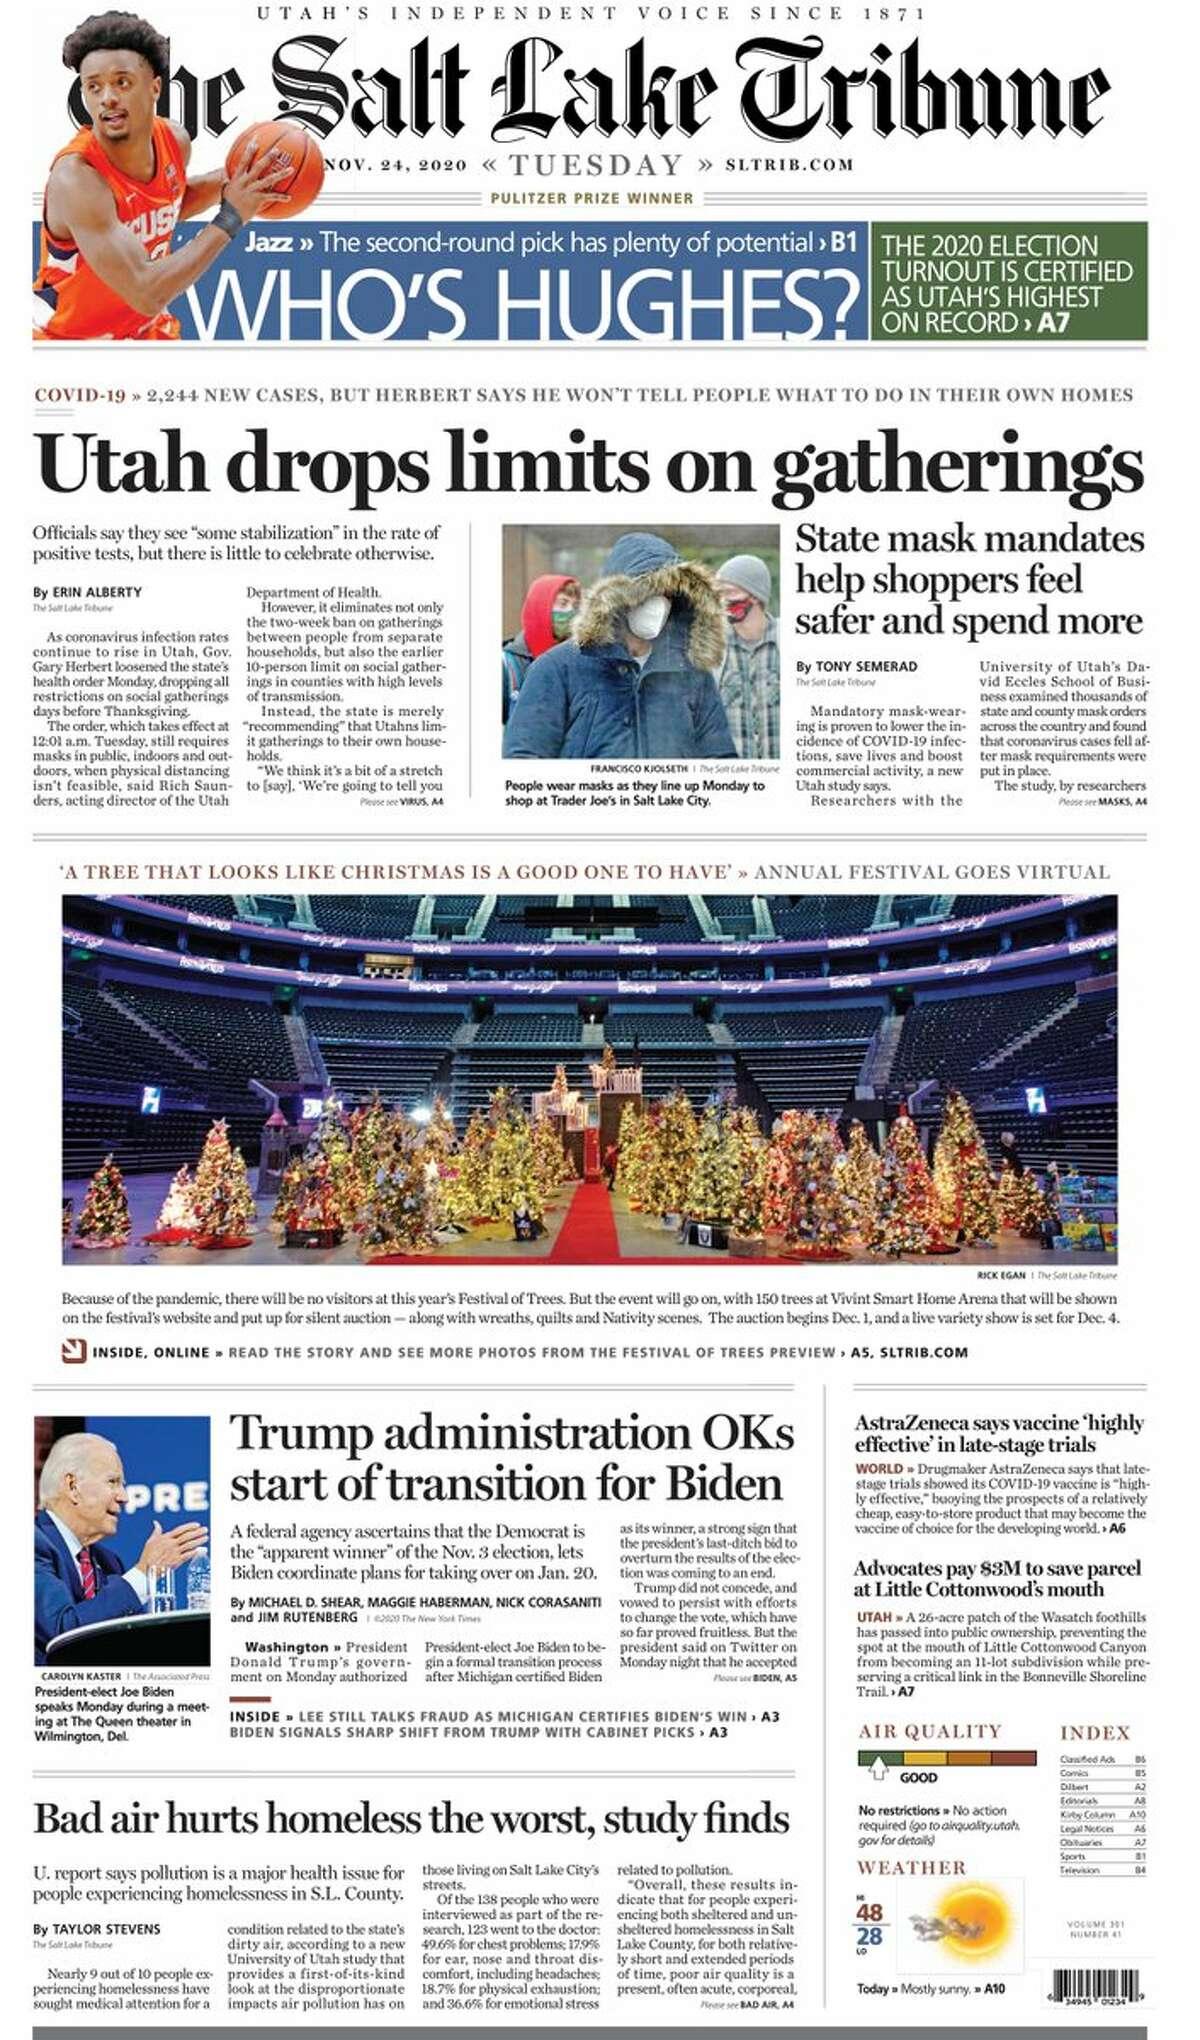 The front page of the Salt Lake Tribune, a Utah newspaper, on Nov. 24, 2020.